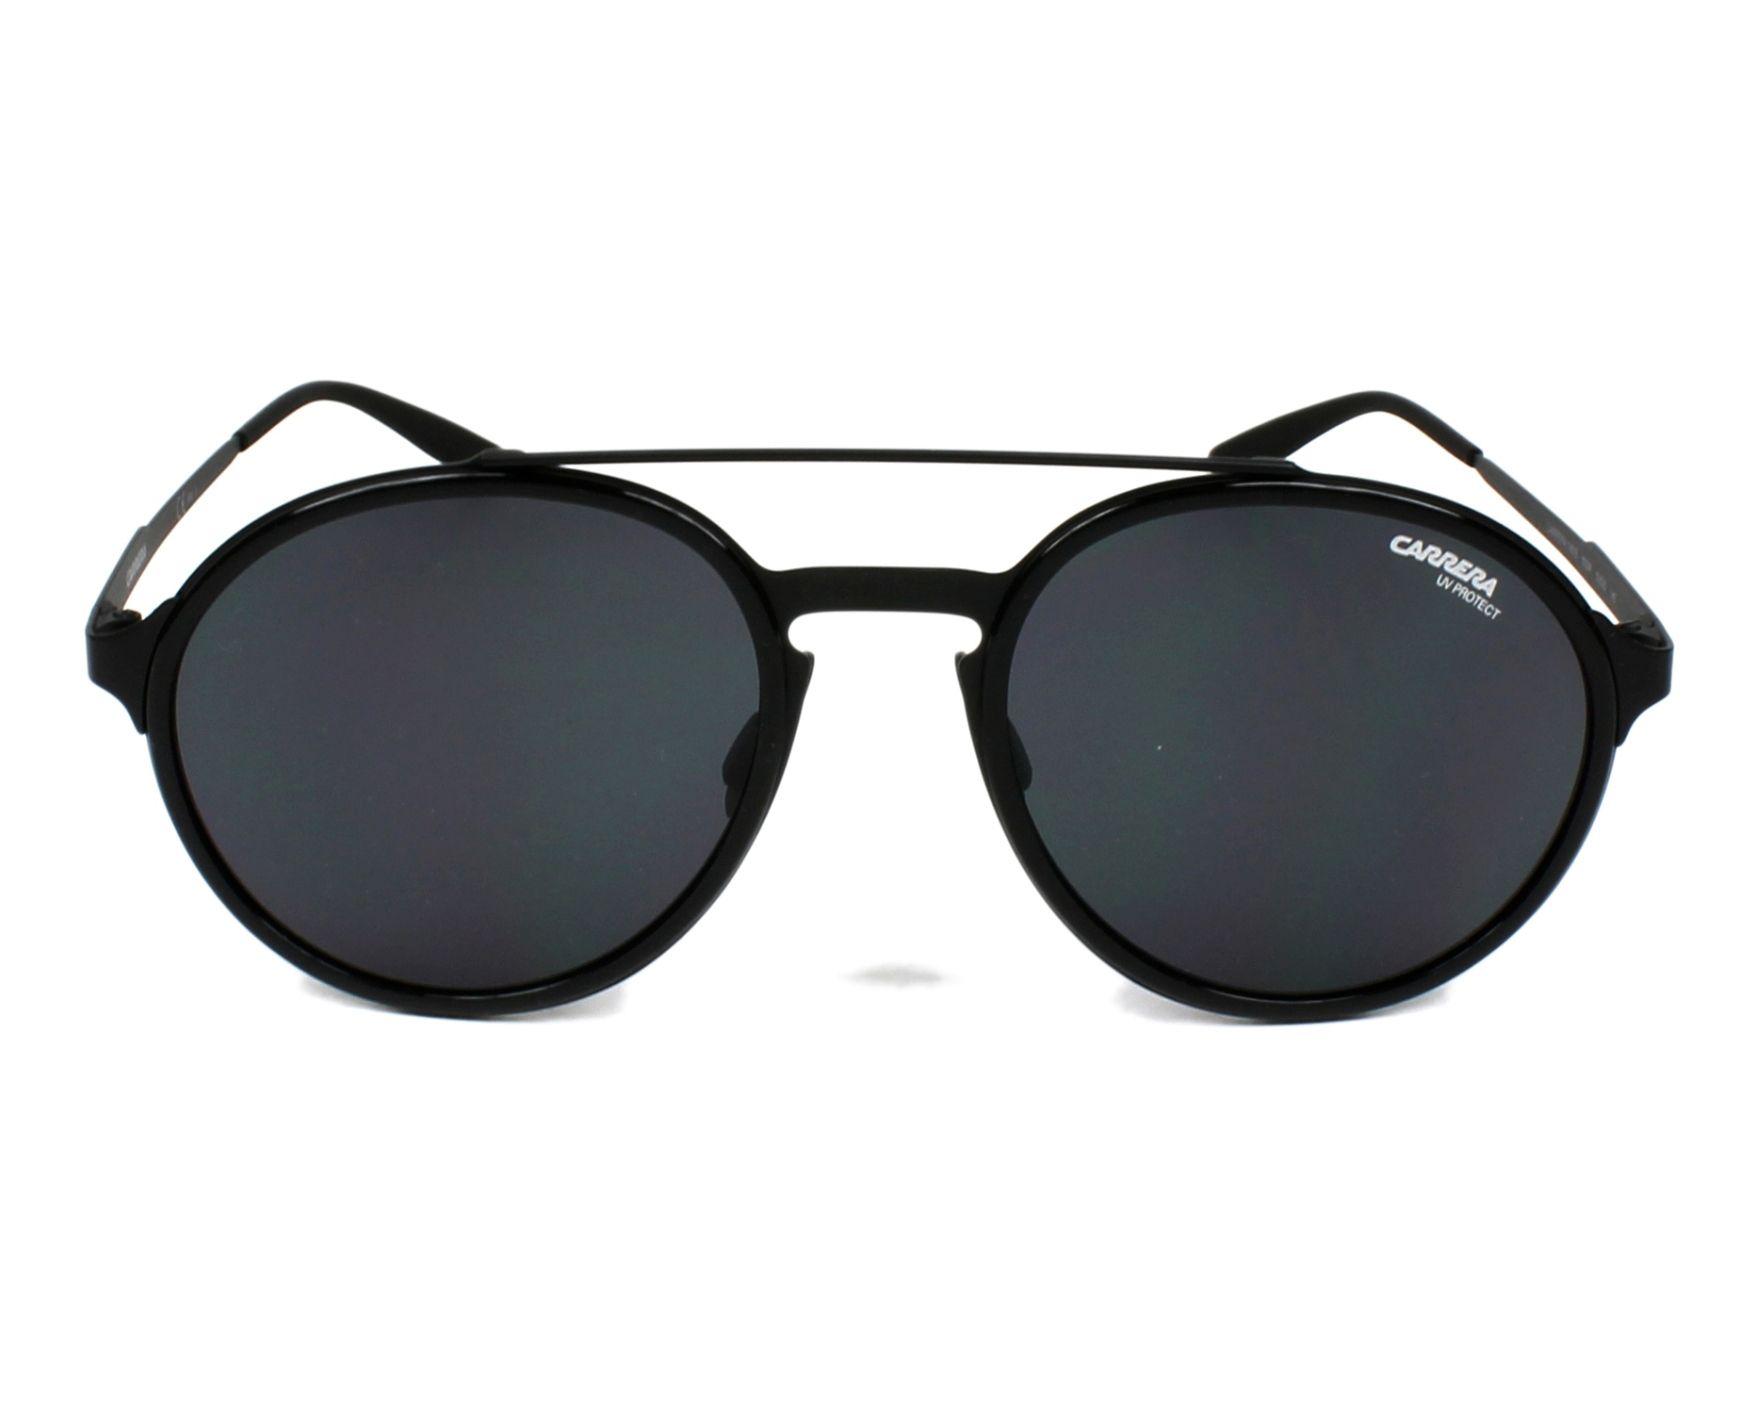 eb9dded5bcc Sunglasses Carrera CARRERA-140-S 003 IR 53-20 Black Black front